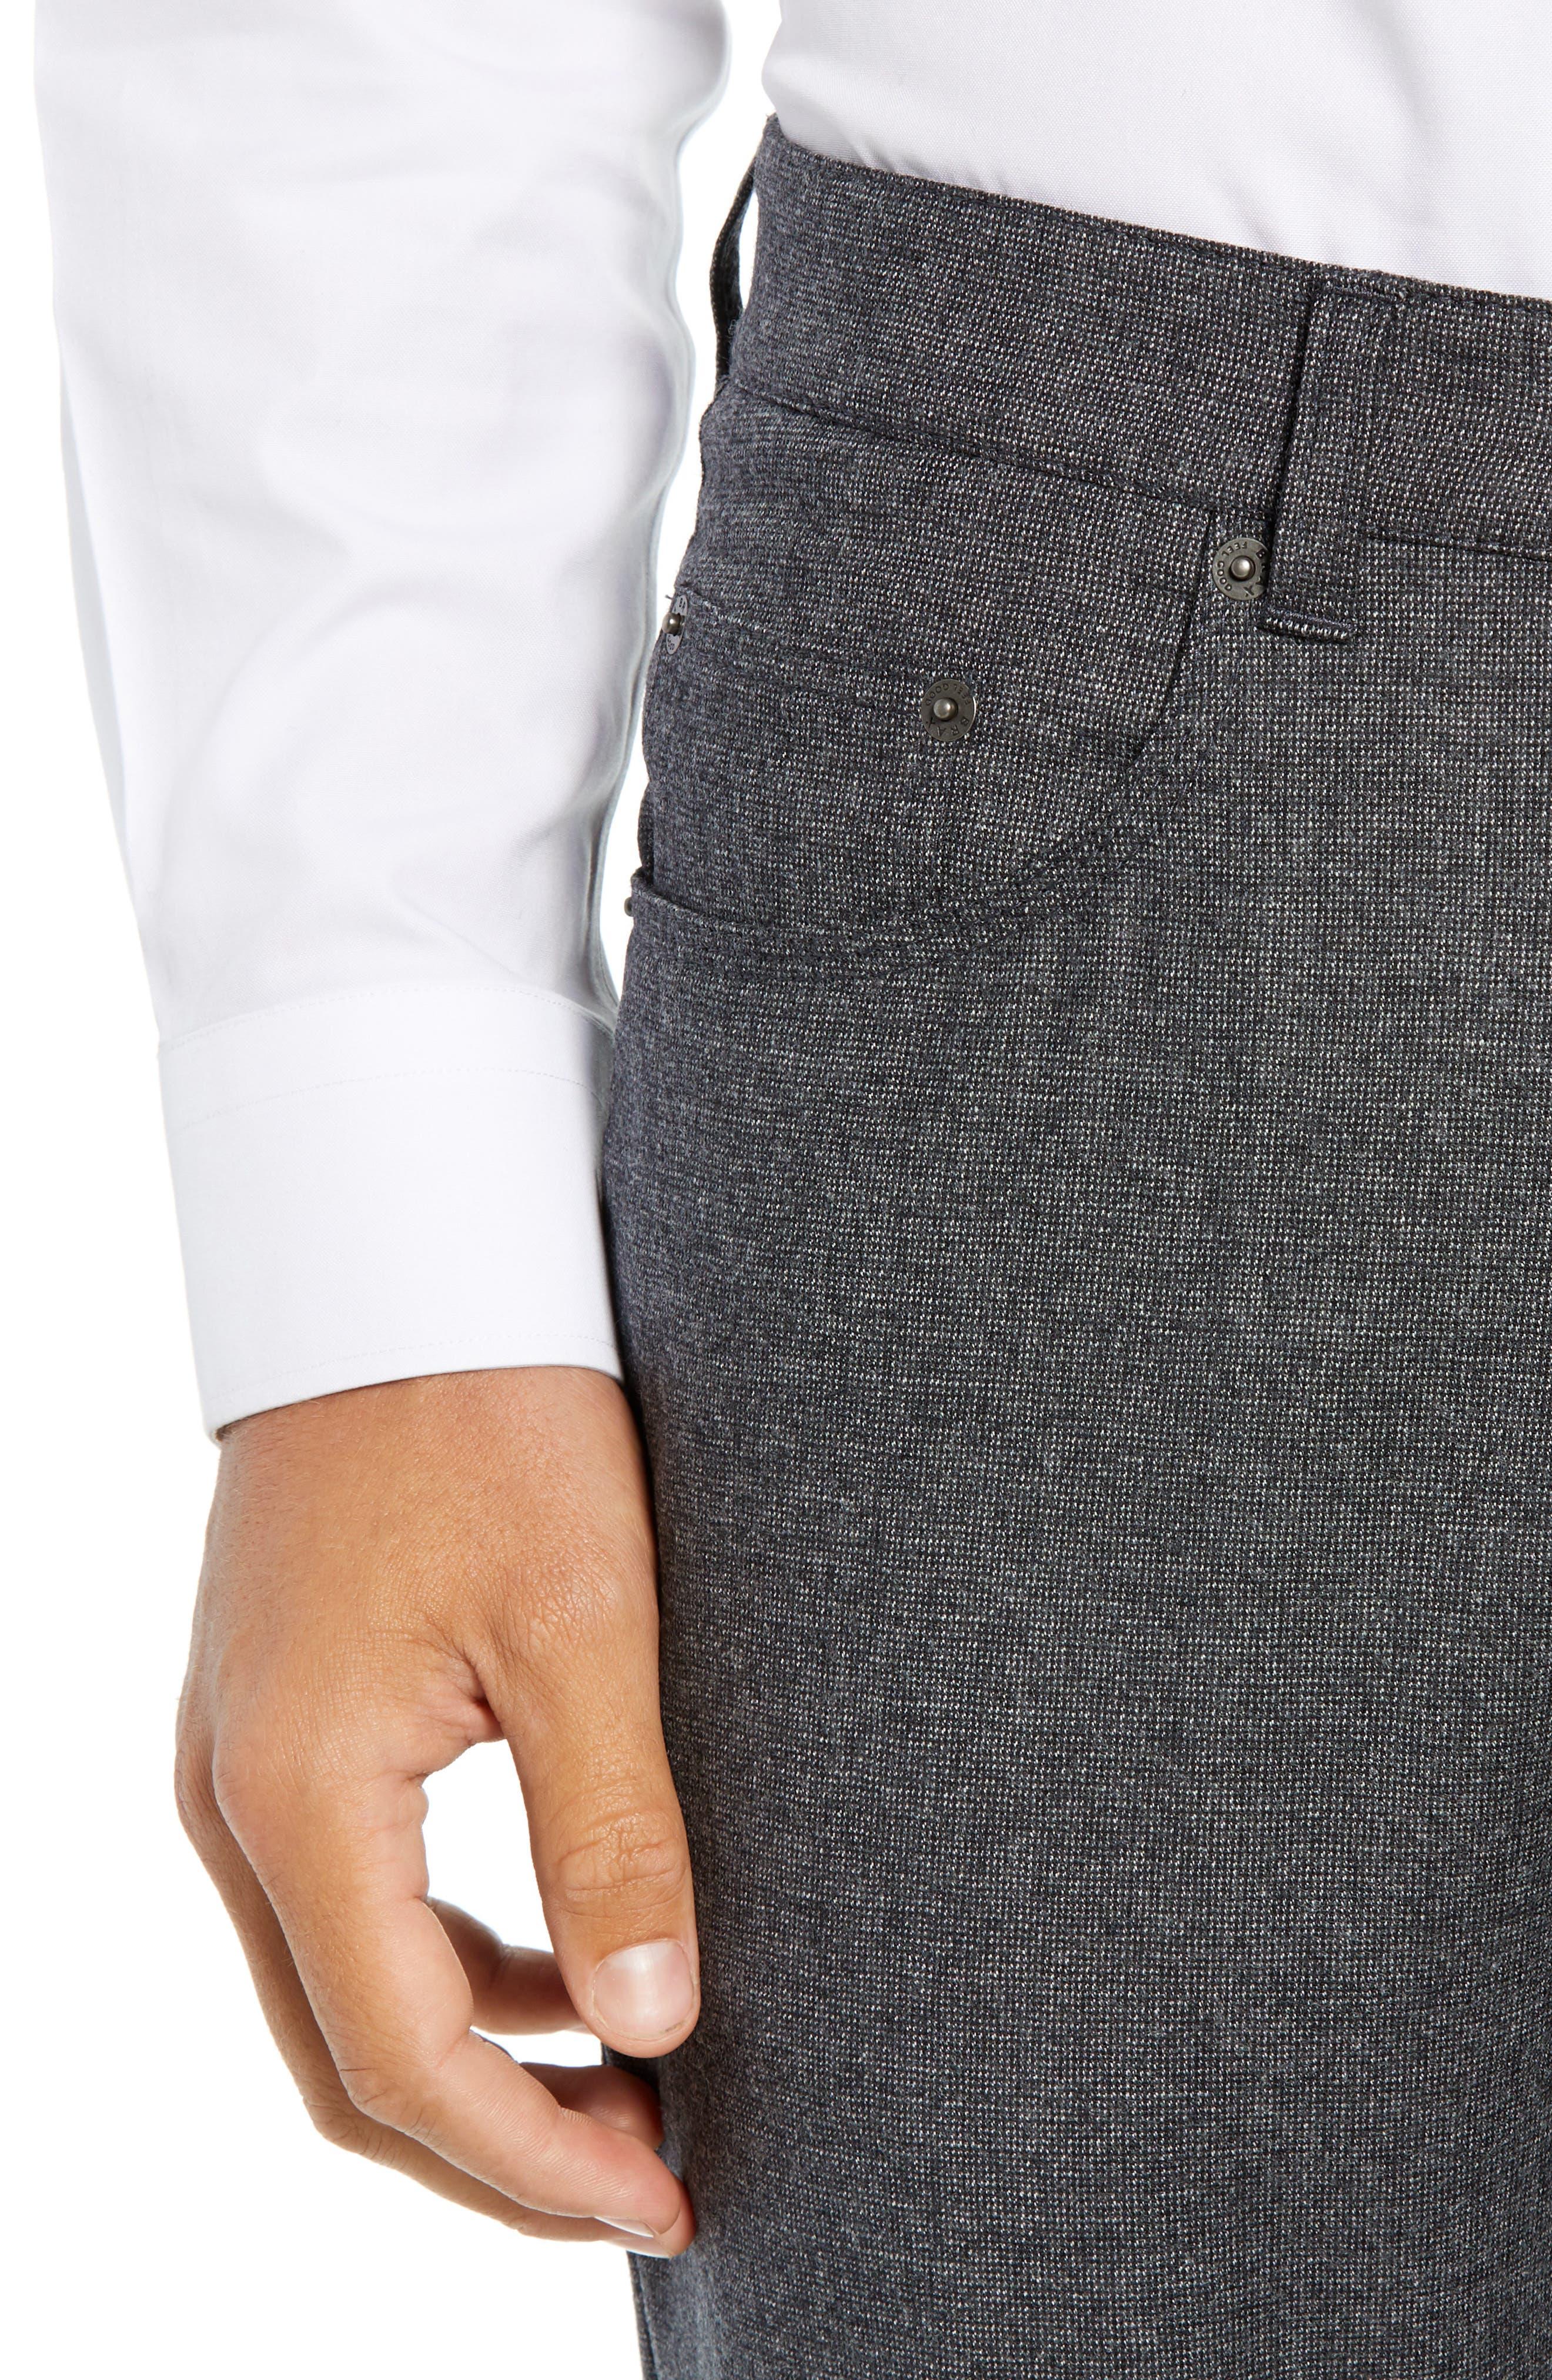 Cadiz Five Pocket Stretch Wool Trousers,                             Alternate thumbnail 4, color,                             GRAPHITE